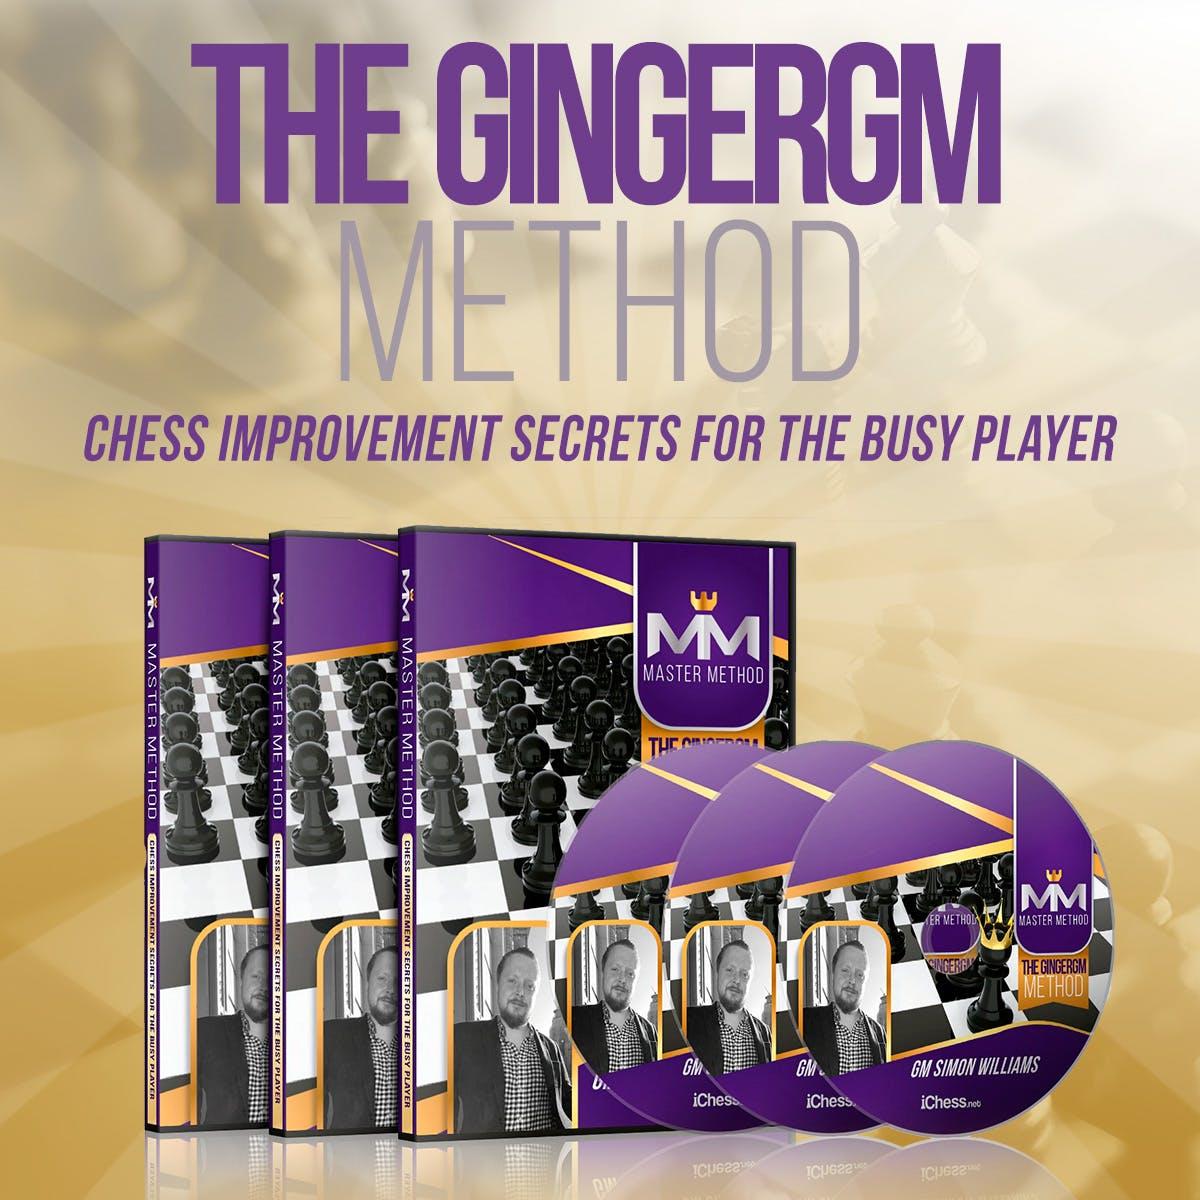 The Ginger GM Method